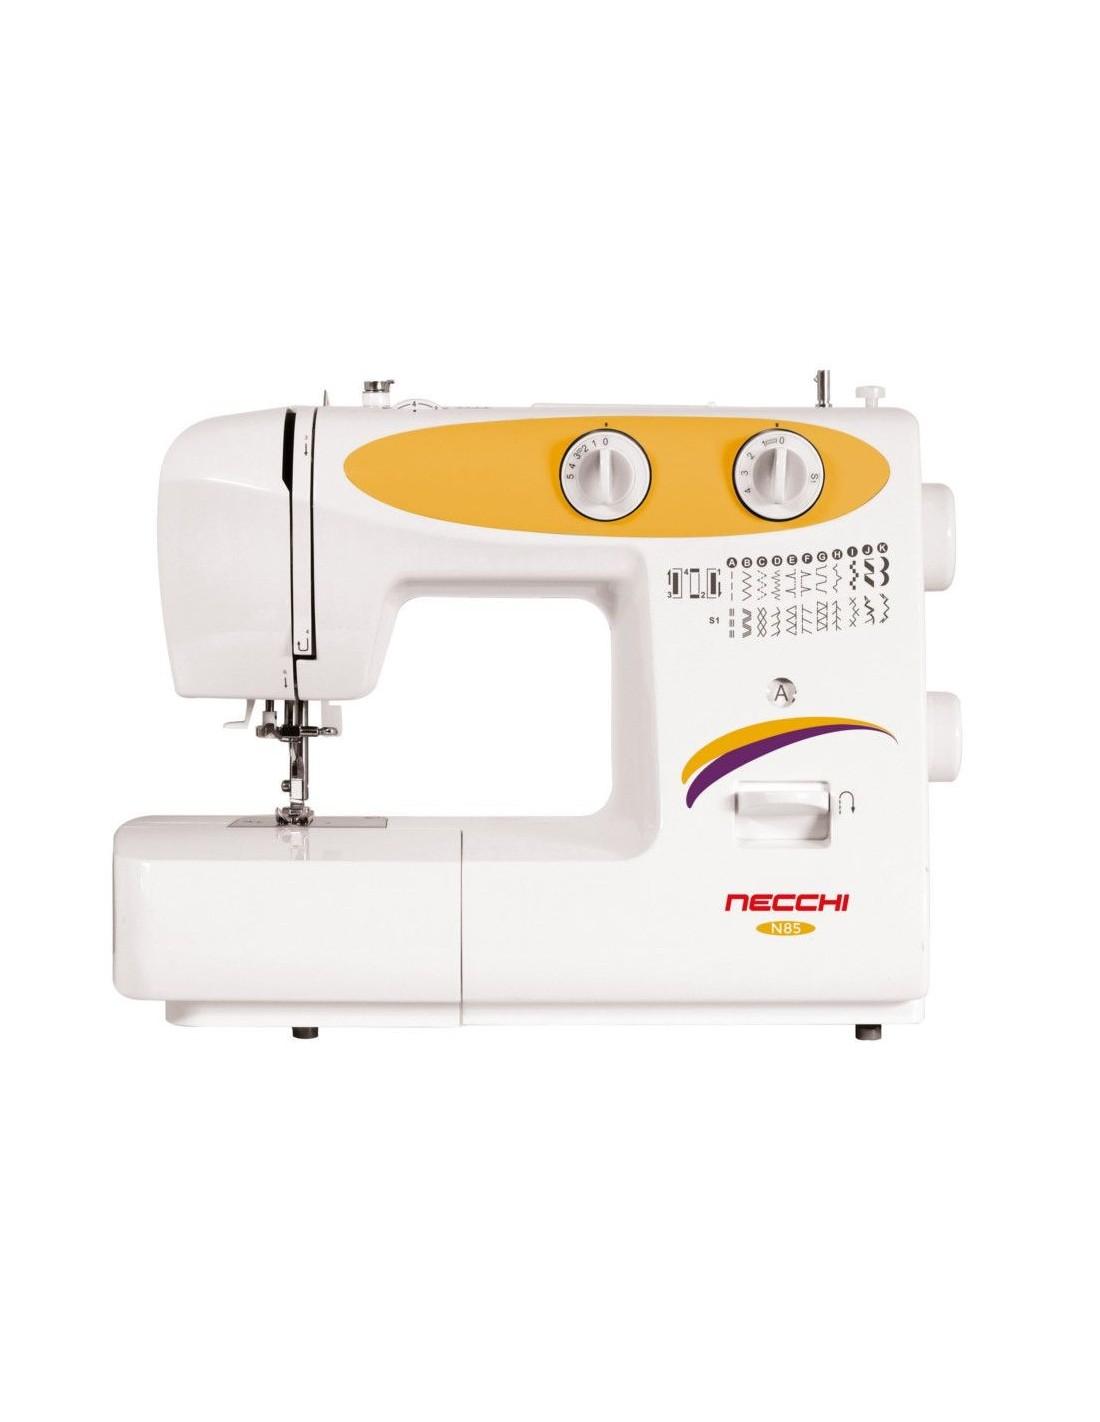 Macchina per cucire necchi n85 macchine per cucire for Macchina per cucire elettrica